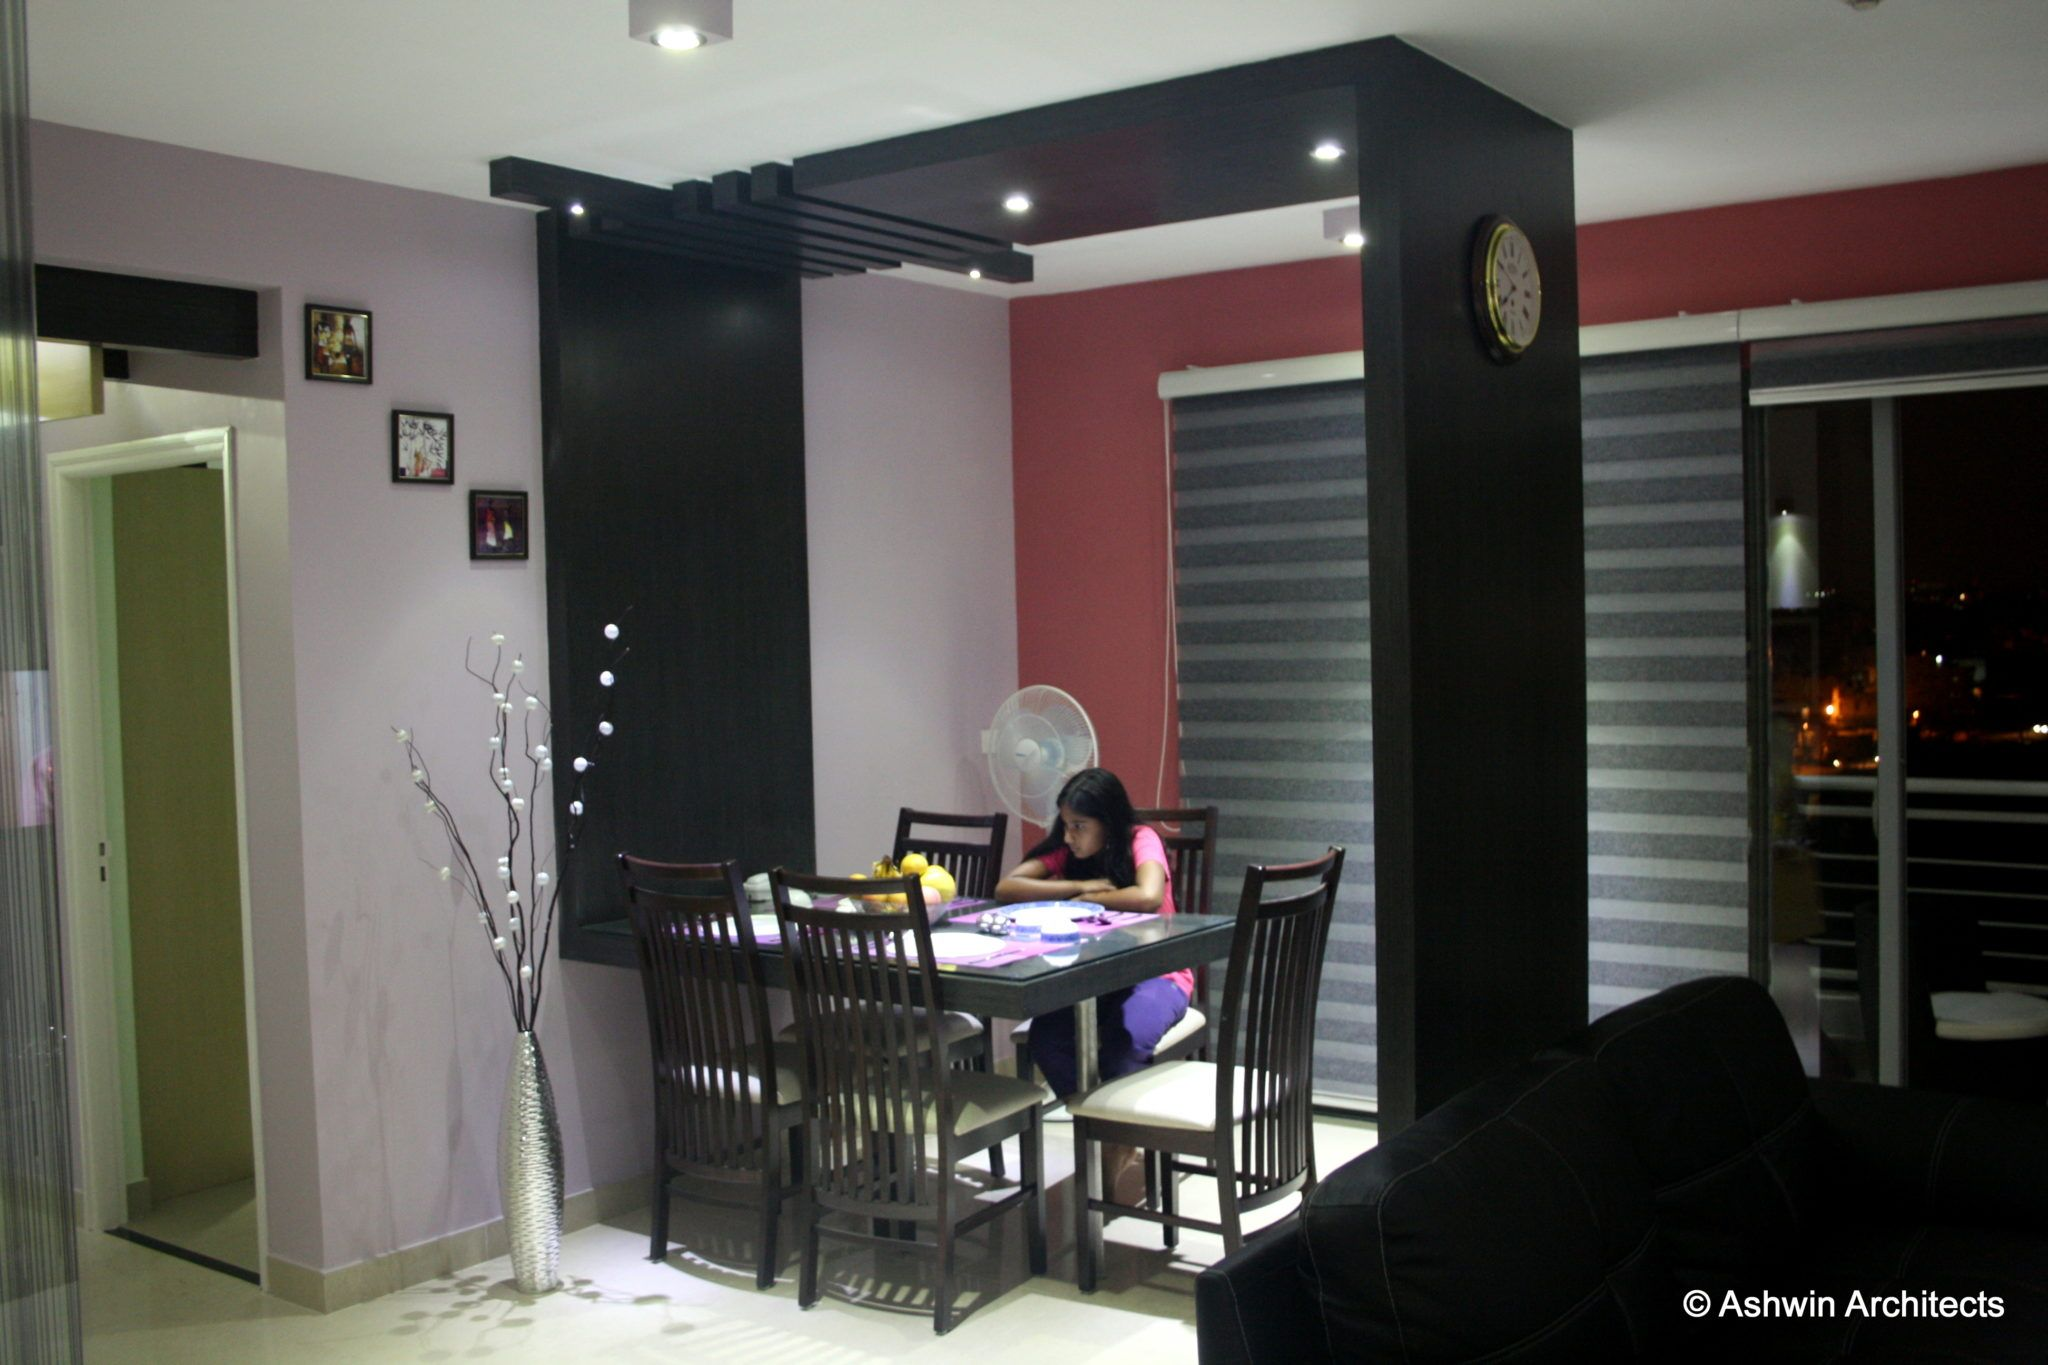 3 bedroom house interior design fyi average size  bedroom house square feet